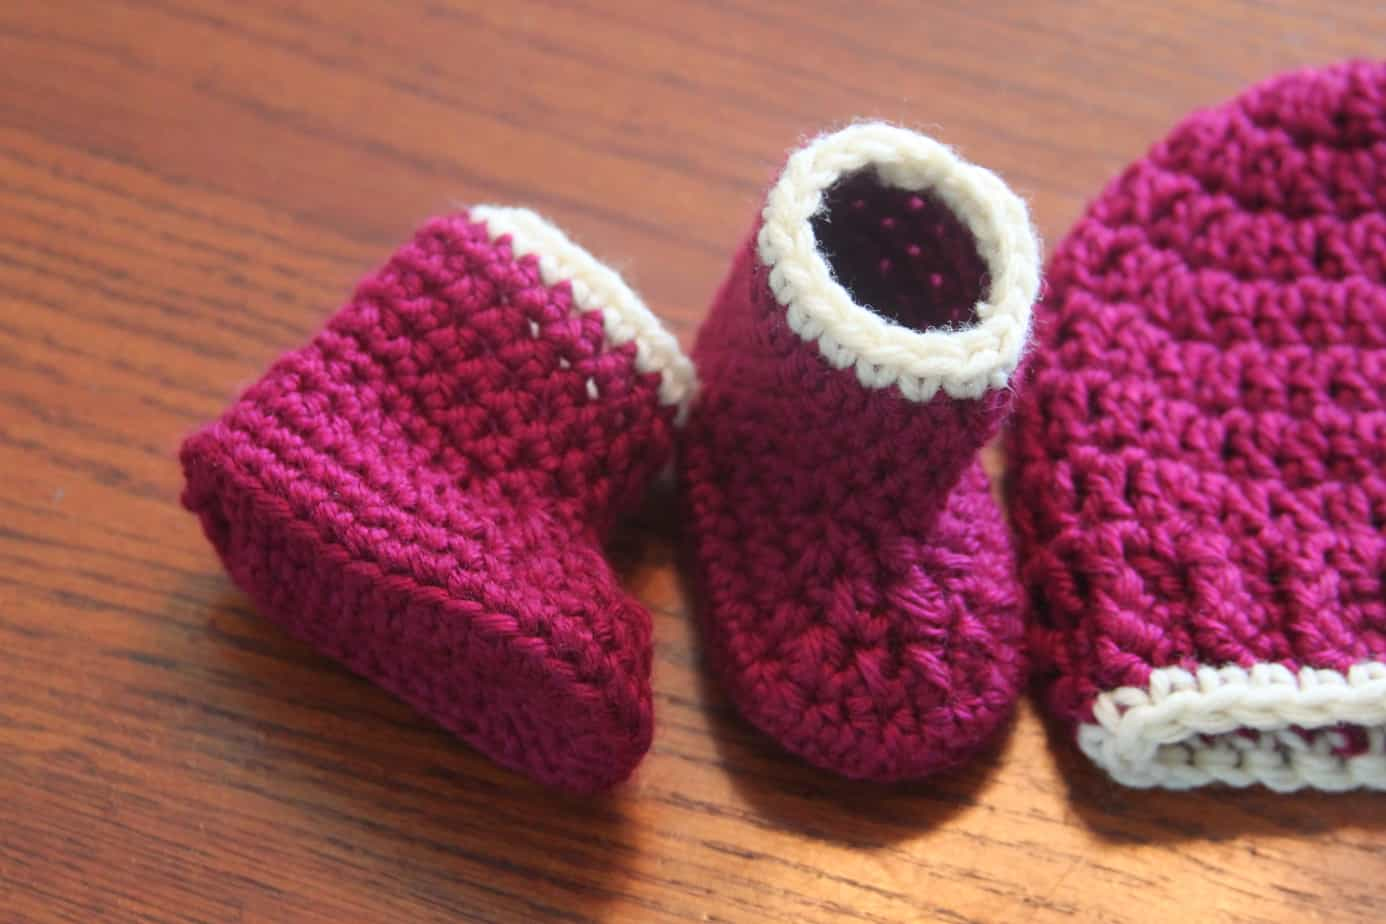 Crochet Baby Booties Free Pattern Crochet Seamless Baby Booties